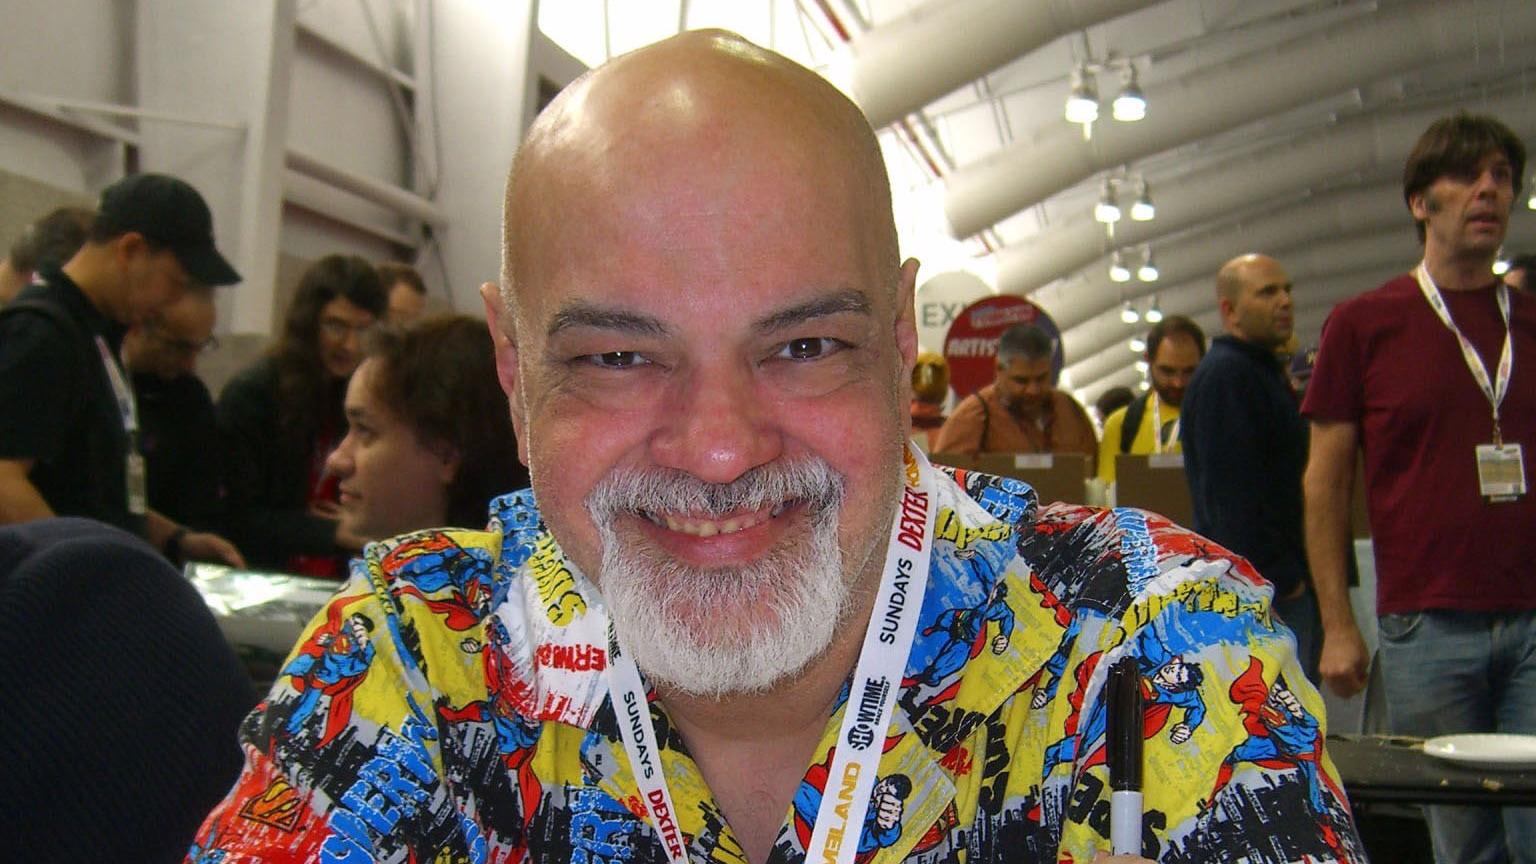 The New Teen Titans Illustrator George Pérez Formally Retires From Comics Work